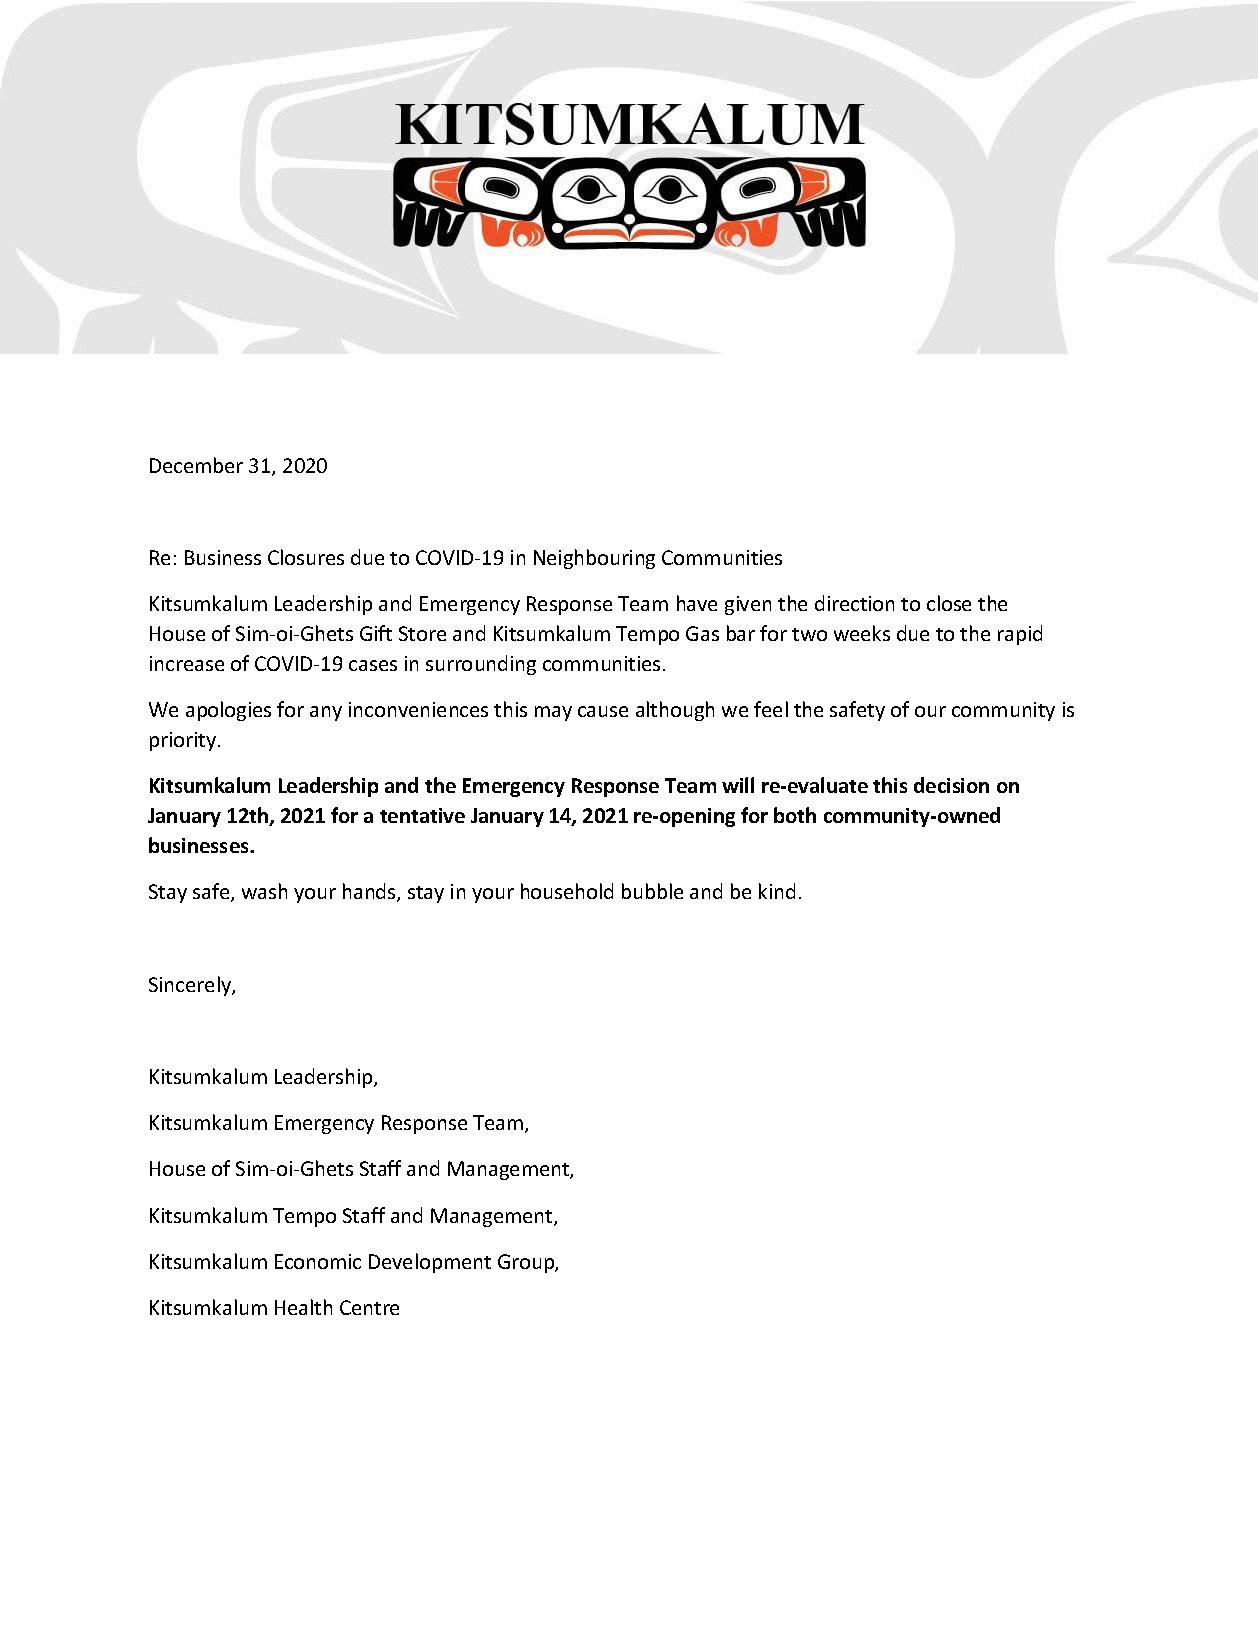 Kitsumkalum Business Closures Due to COVID-19 in Neighbouring Communities